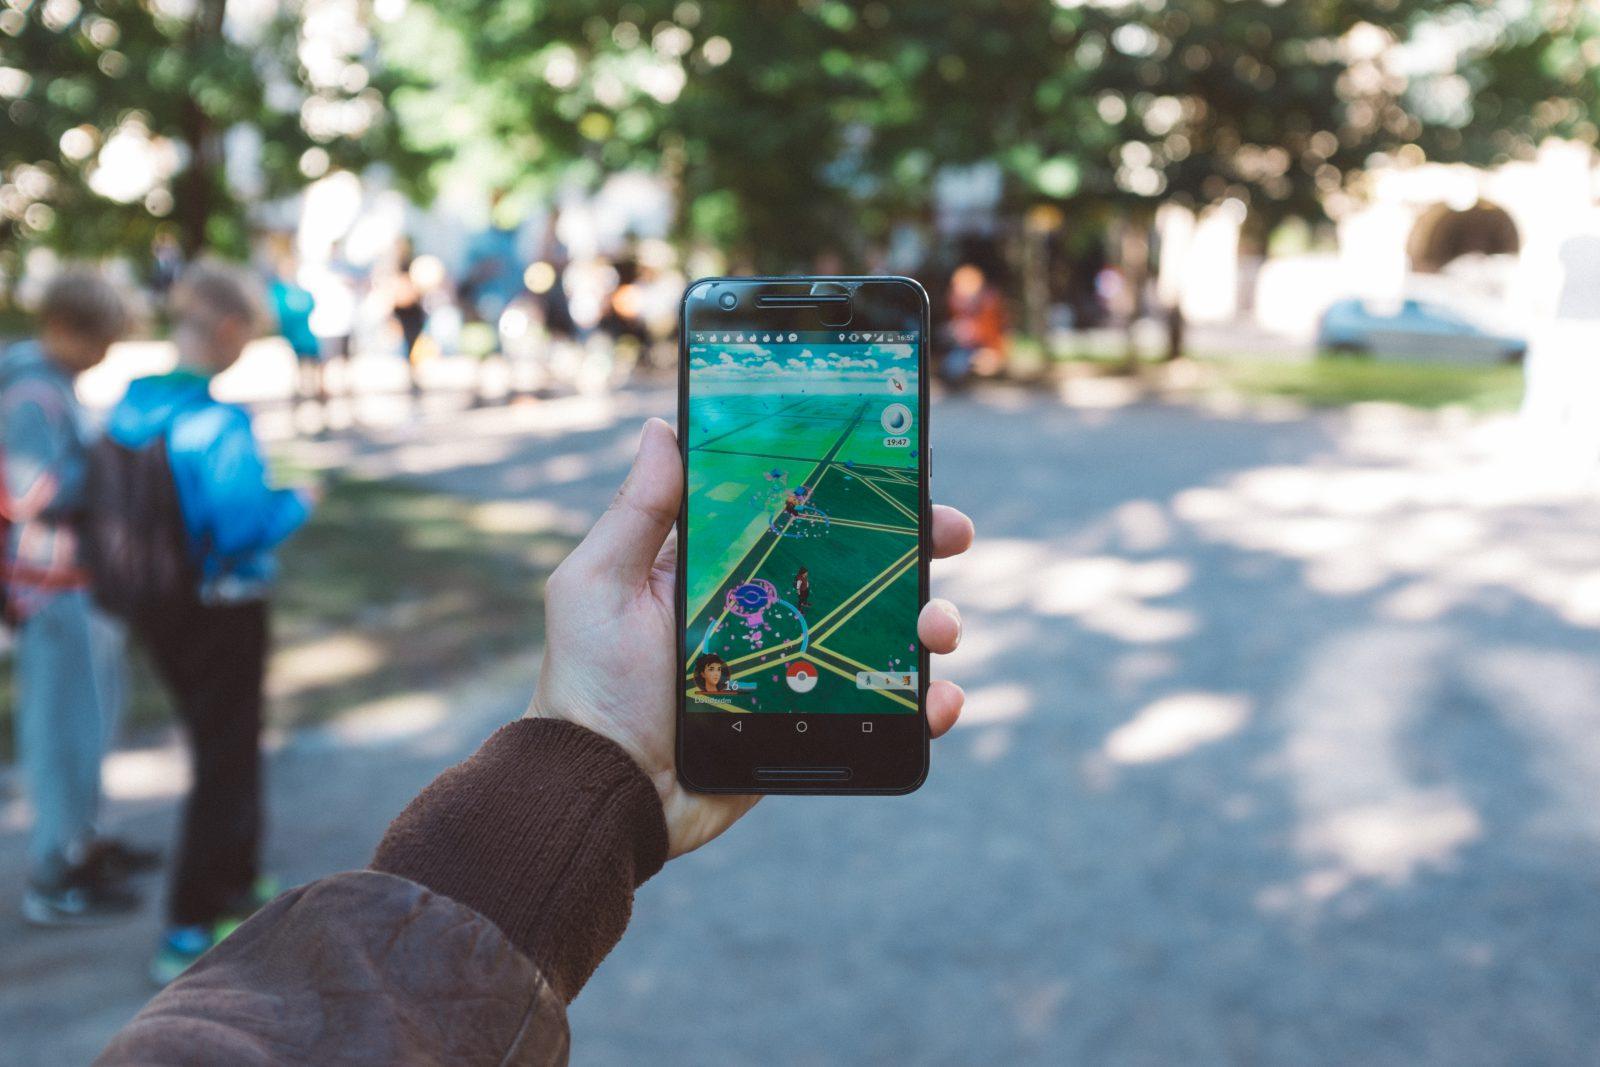 Pokémon Go krijgt nieuwe AR multiplayer-functie: Buddy Adventure - Want